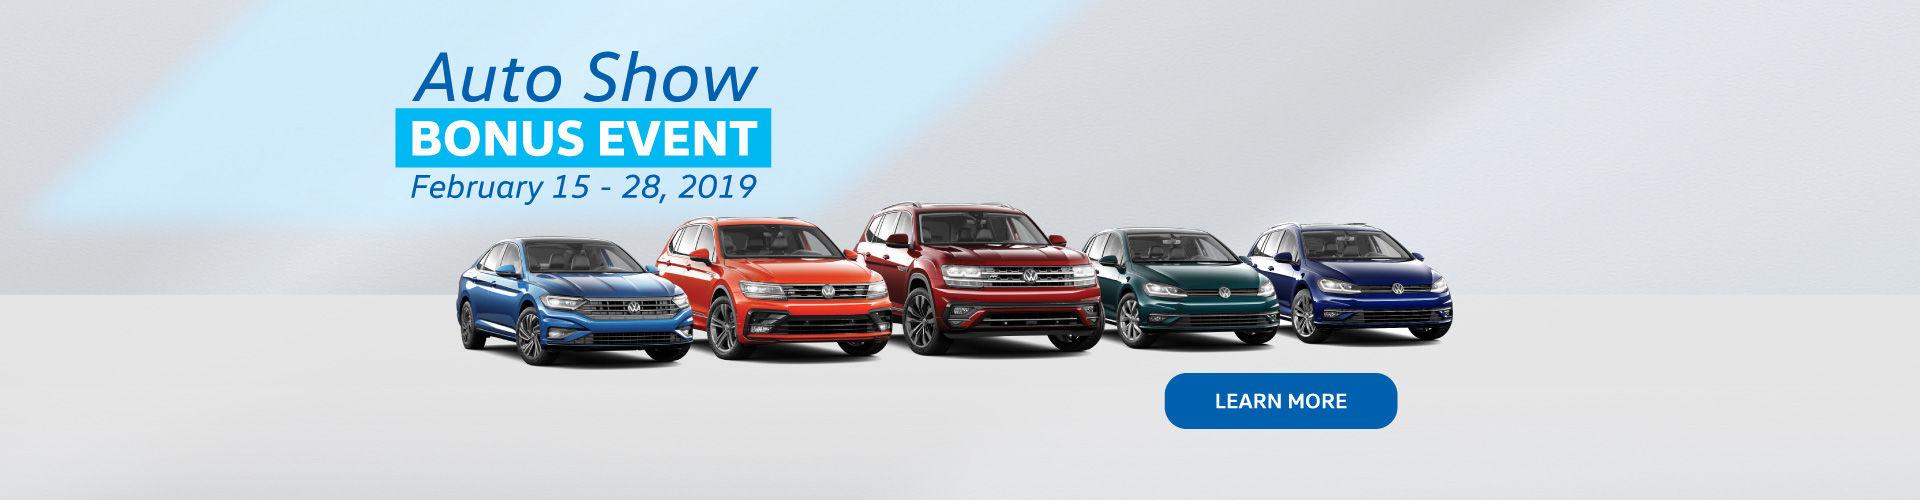 Auto Show Bonus Event